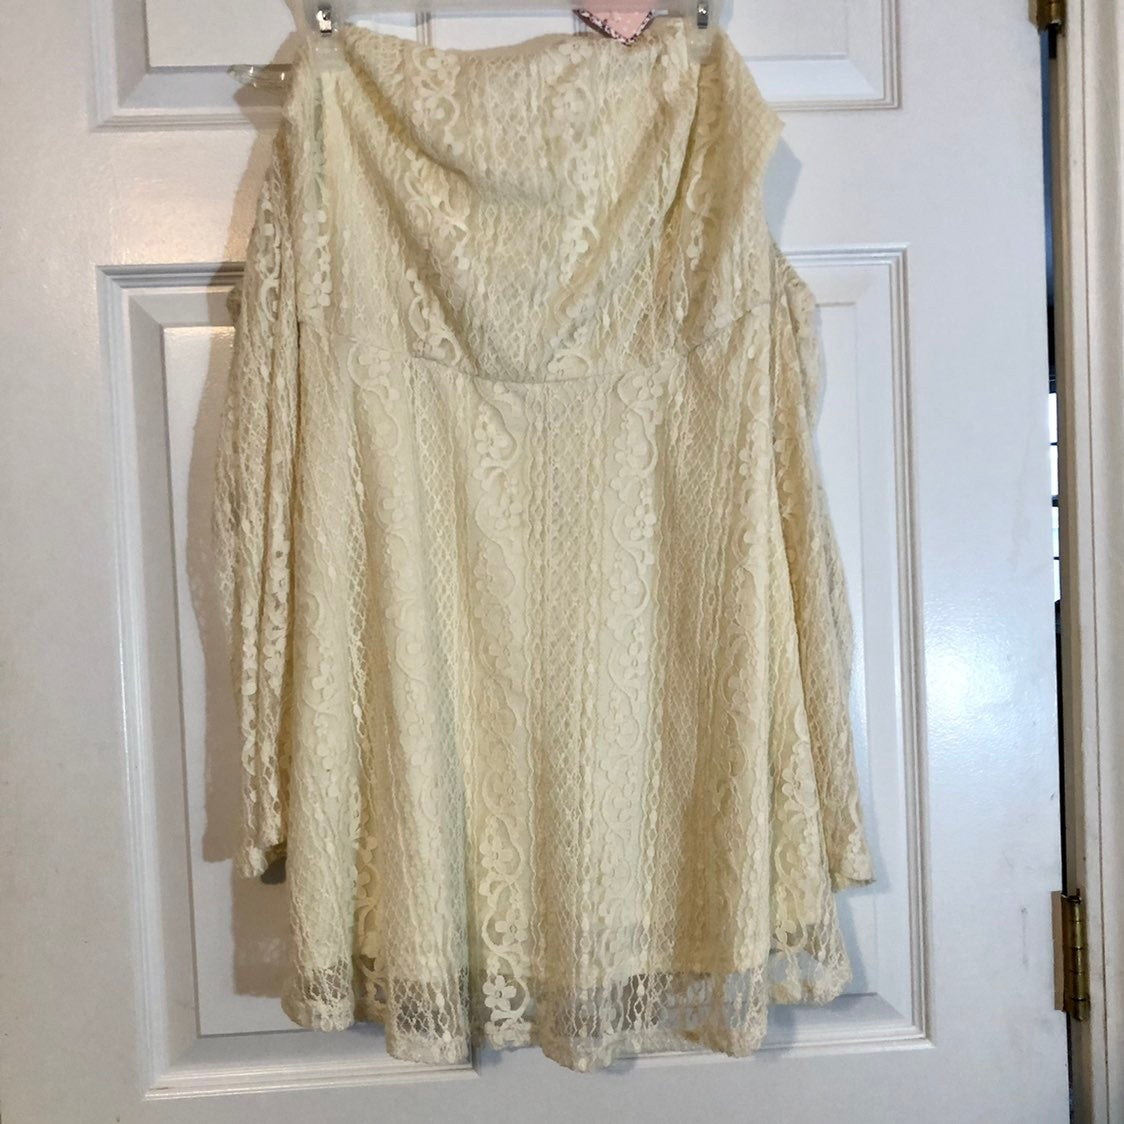 NWT Pink Owl Off Shoulder Lace Dress - L